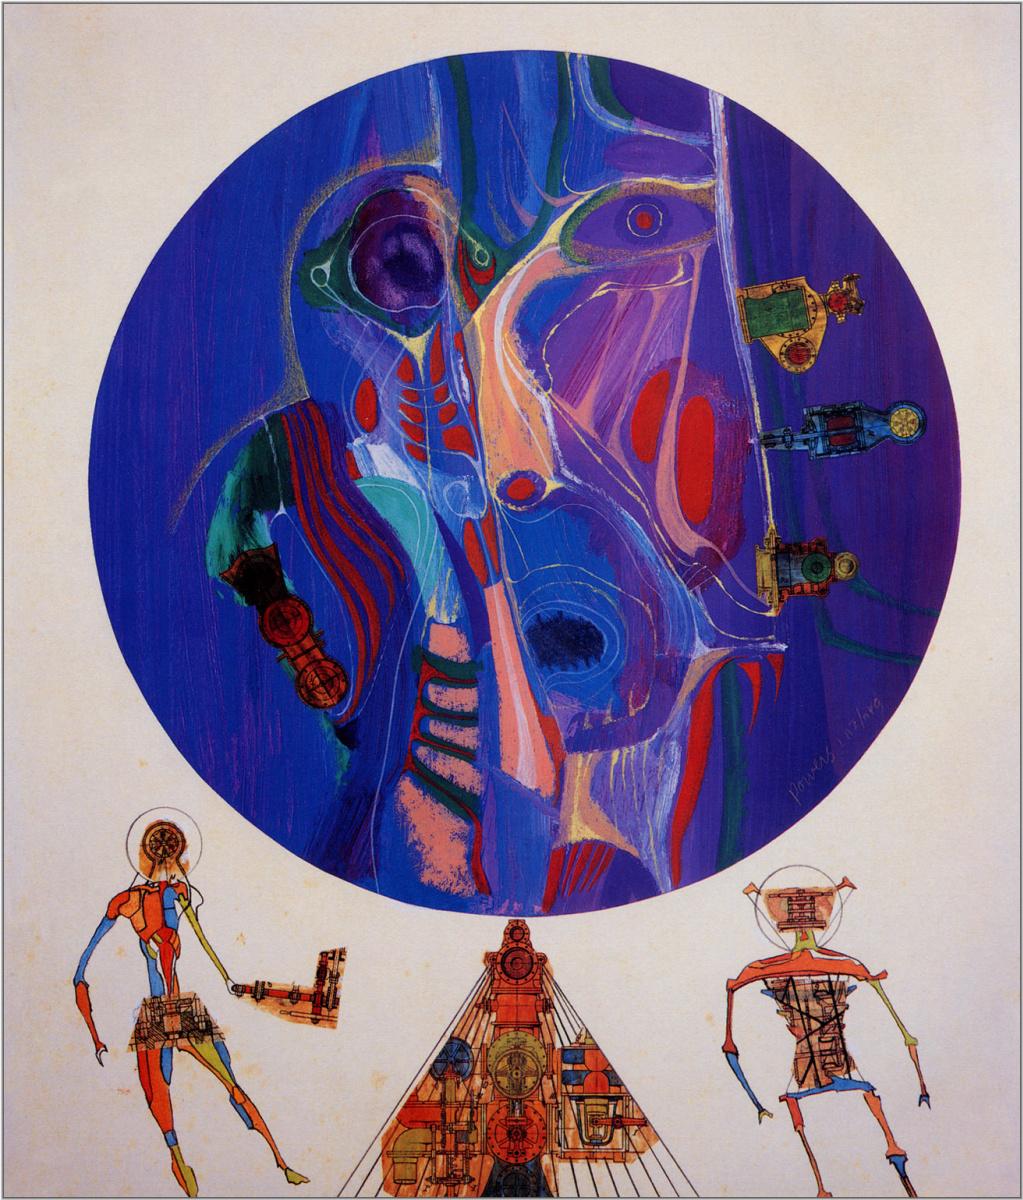 Richard Powers. New worlds